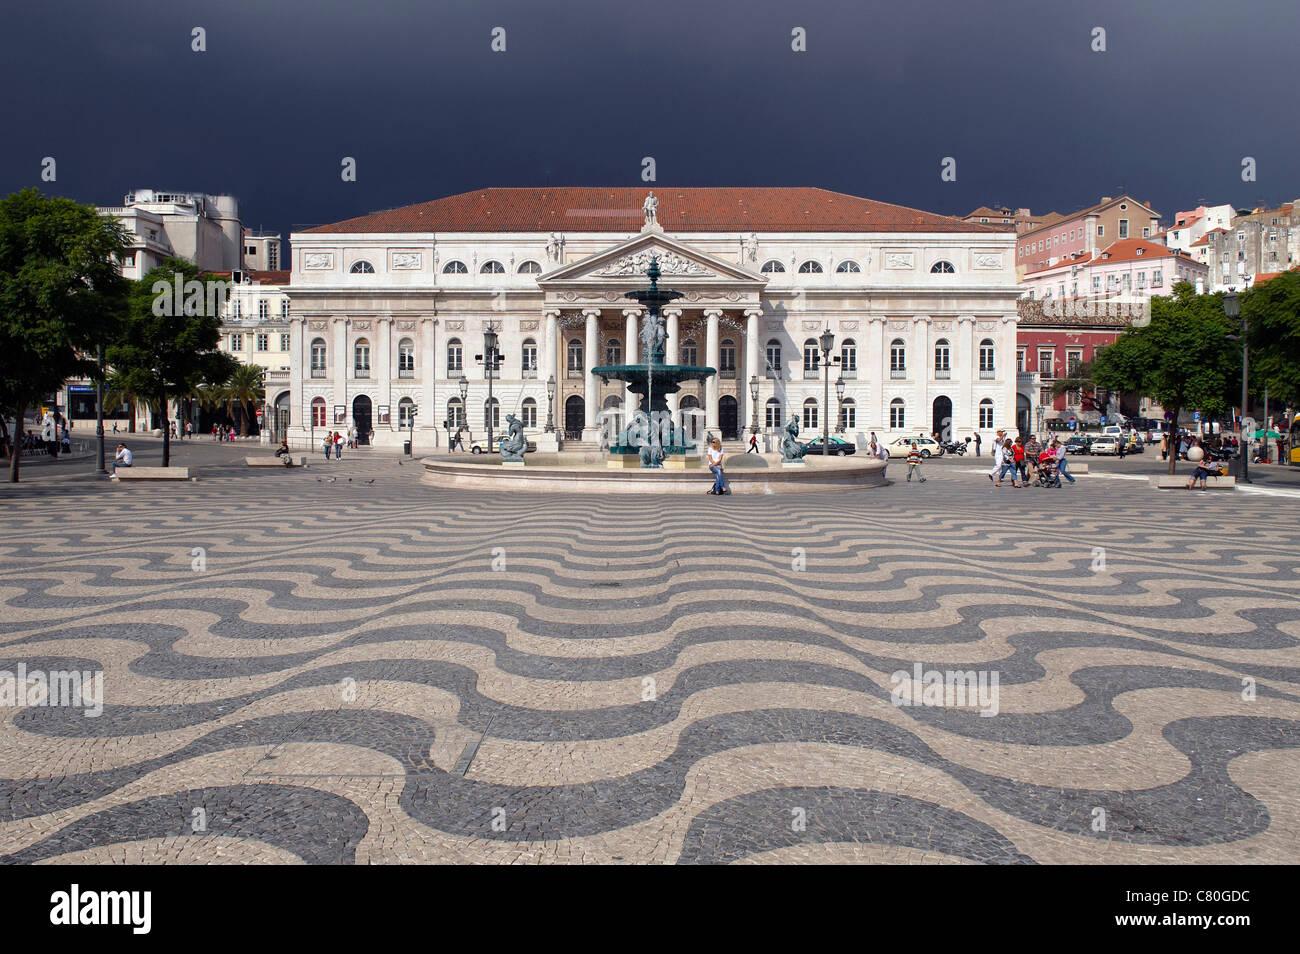 Portugal, Lisbon, Rossio Square. Dona Maria II National Theater. Stock Photo